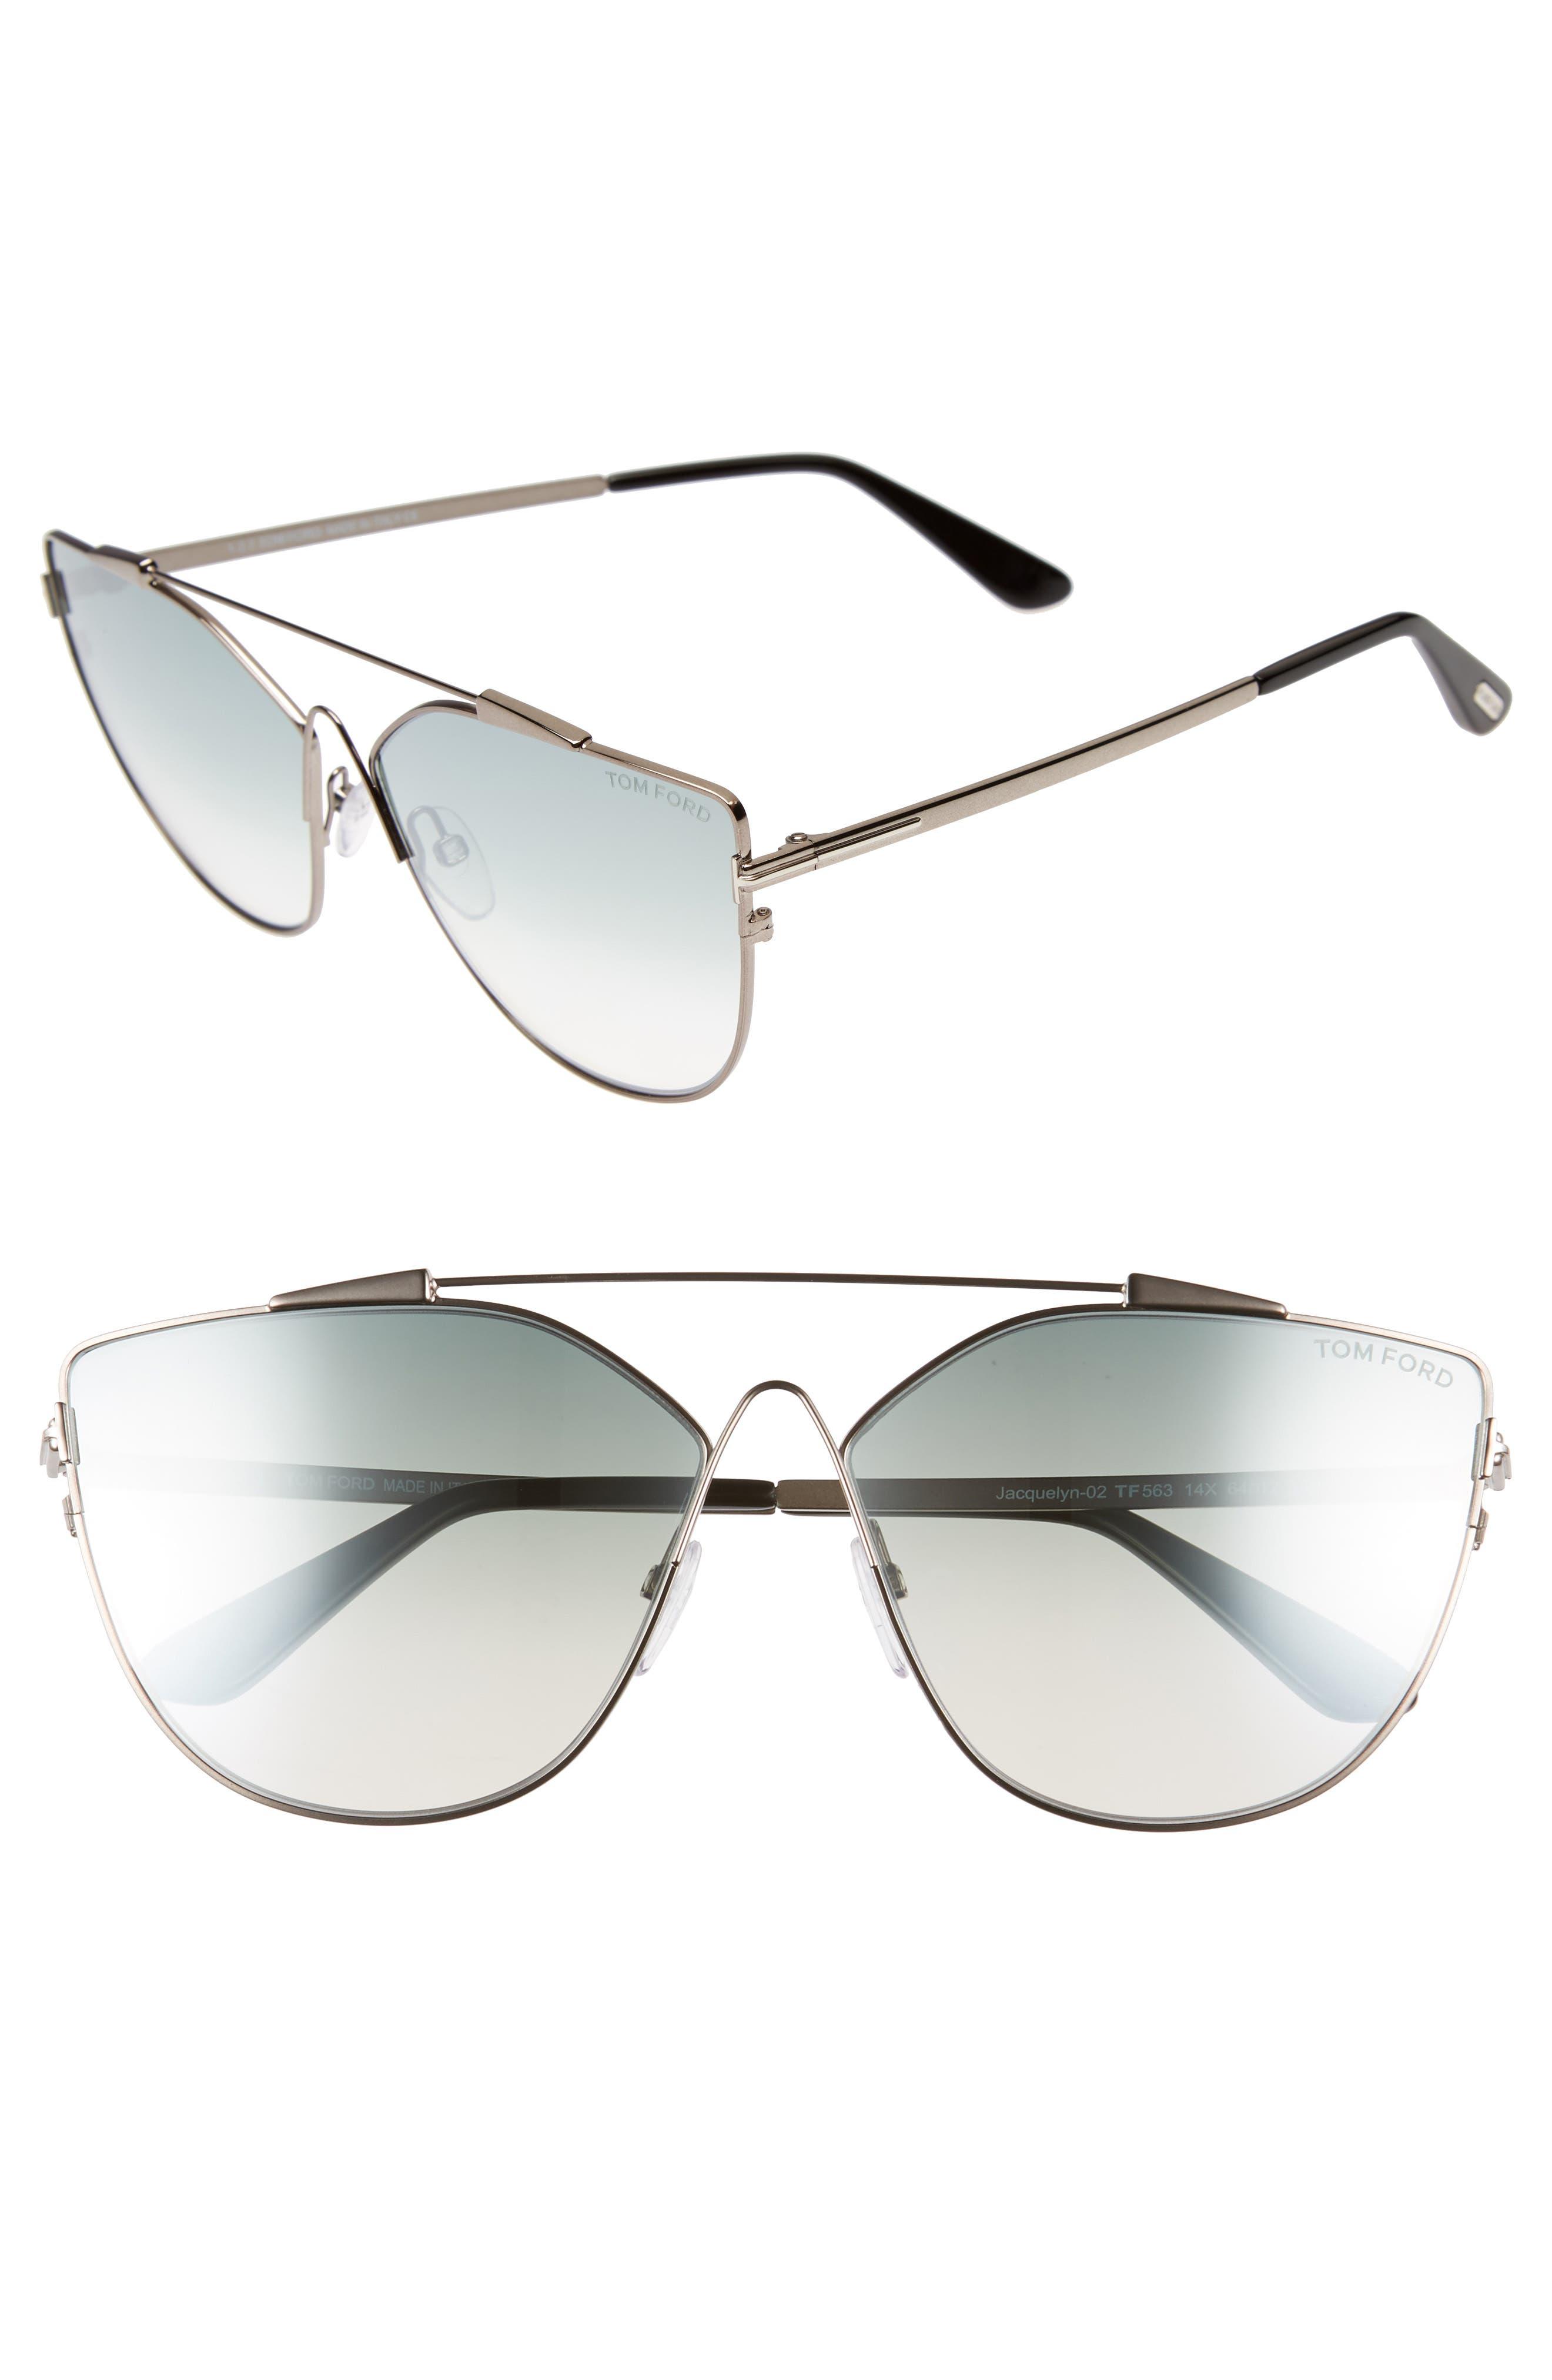 Jacquelyn 64mm Cat Eye Sunglasses,                         Main,                         color, Light Ruthenium/ Blue Mirror